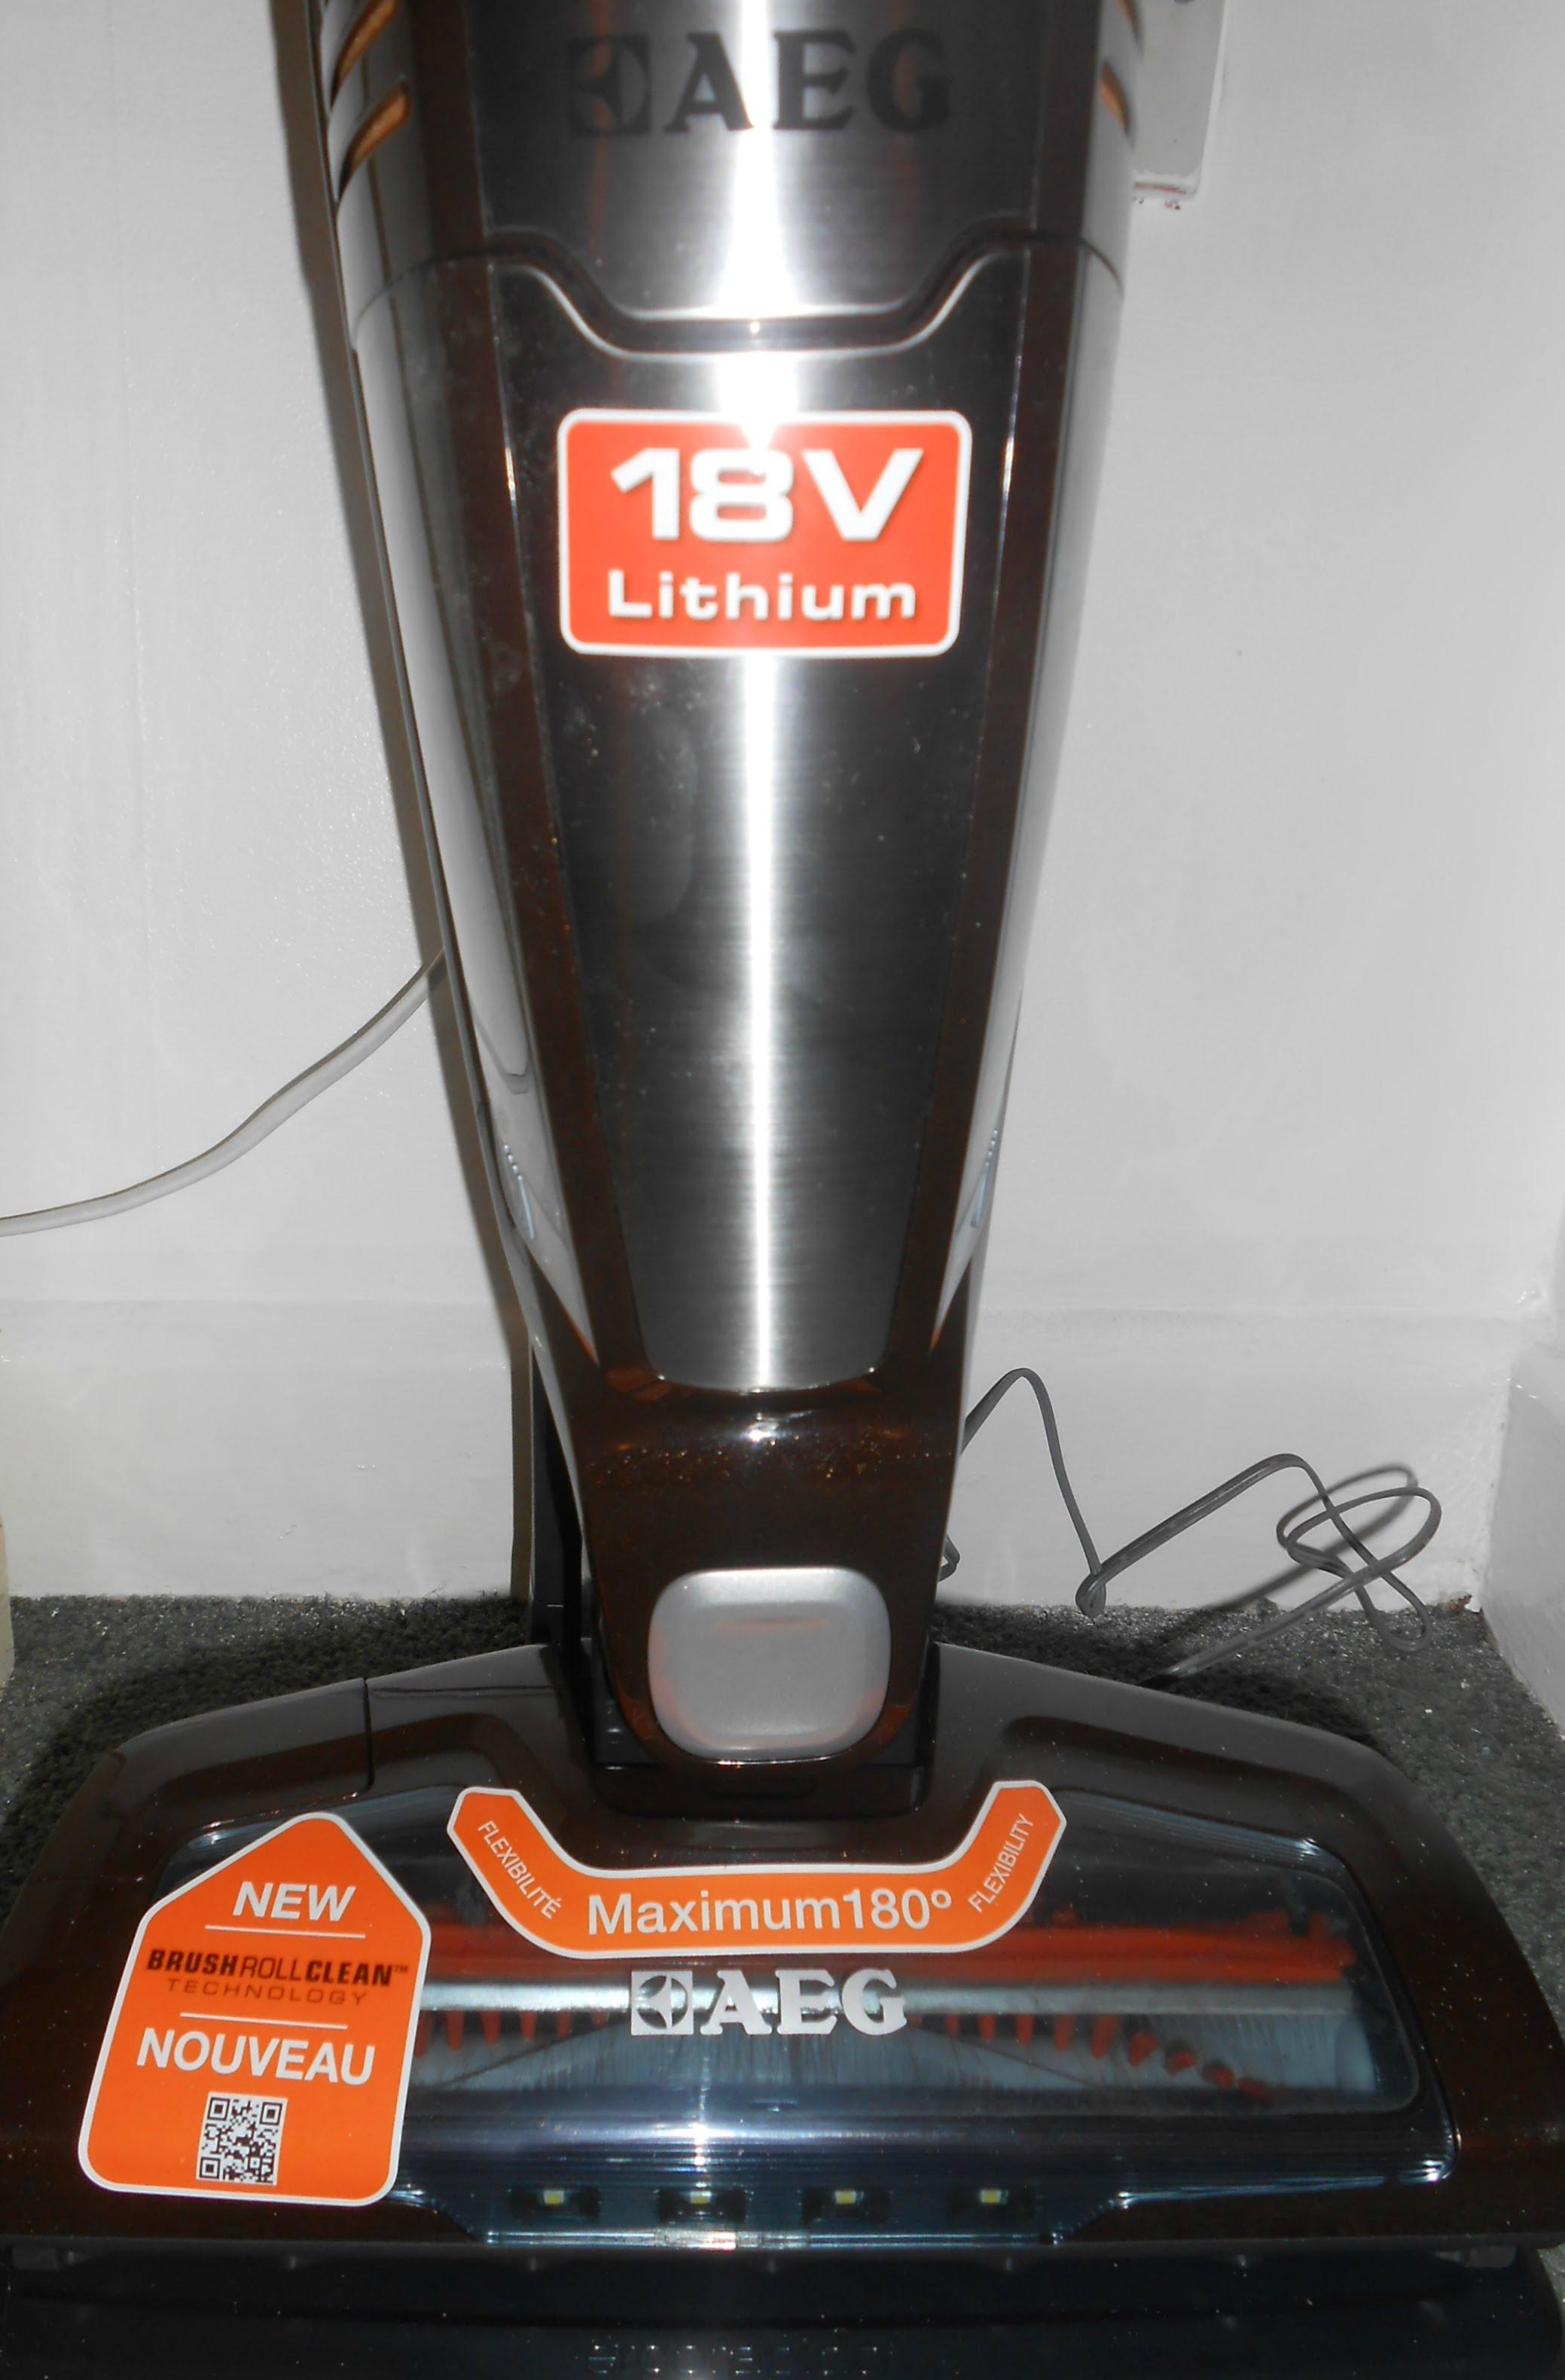 electrolux ergorapido plus lithium 18v